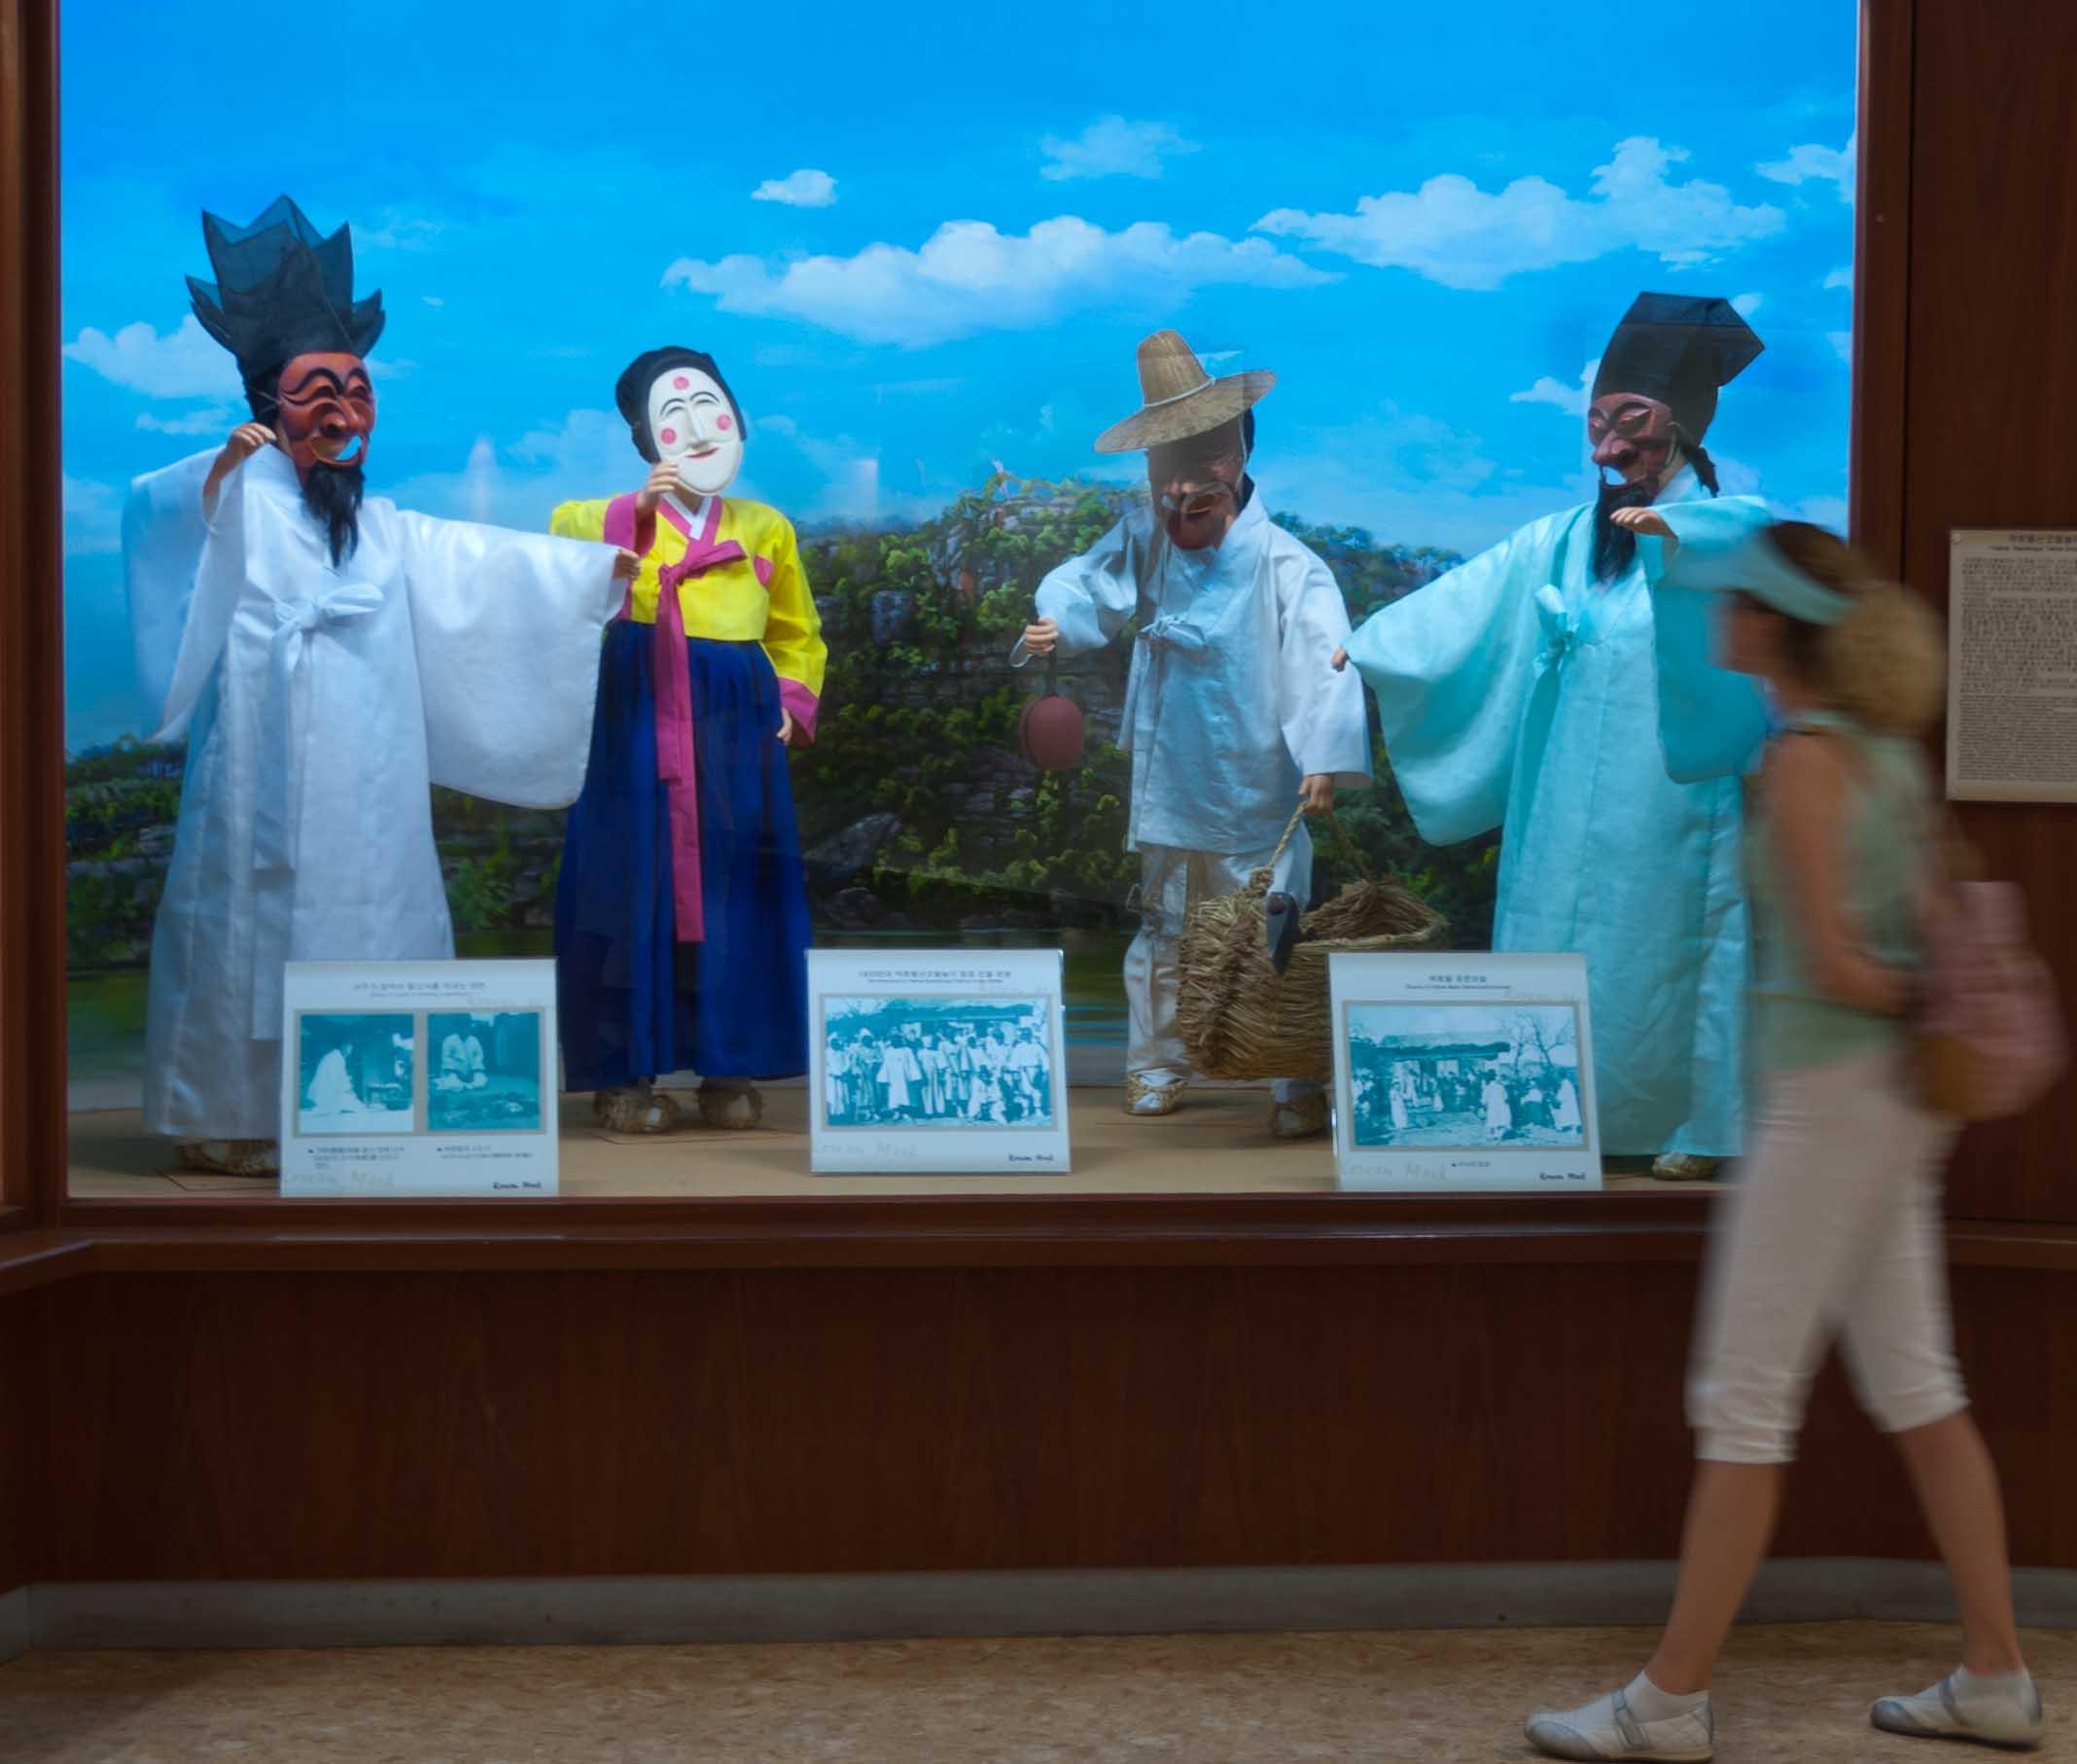 Hahoe Mask Museum, Andong, South Korea